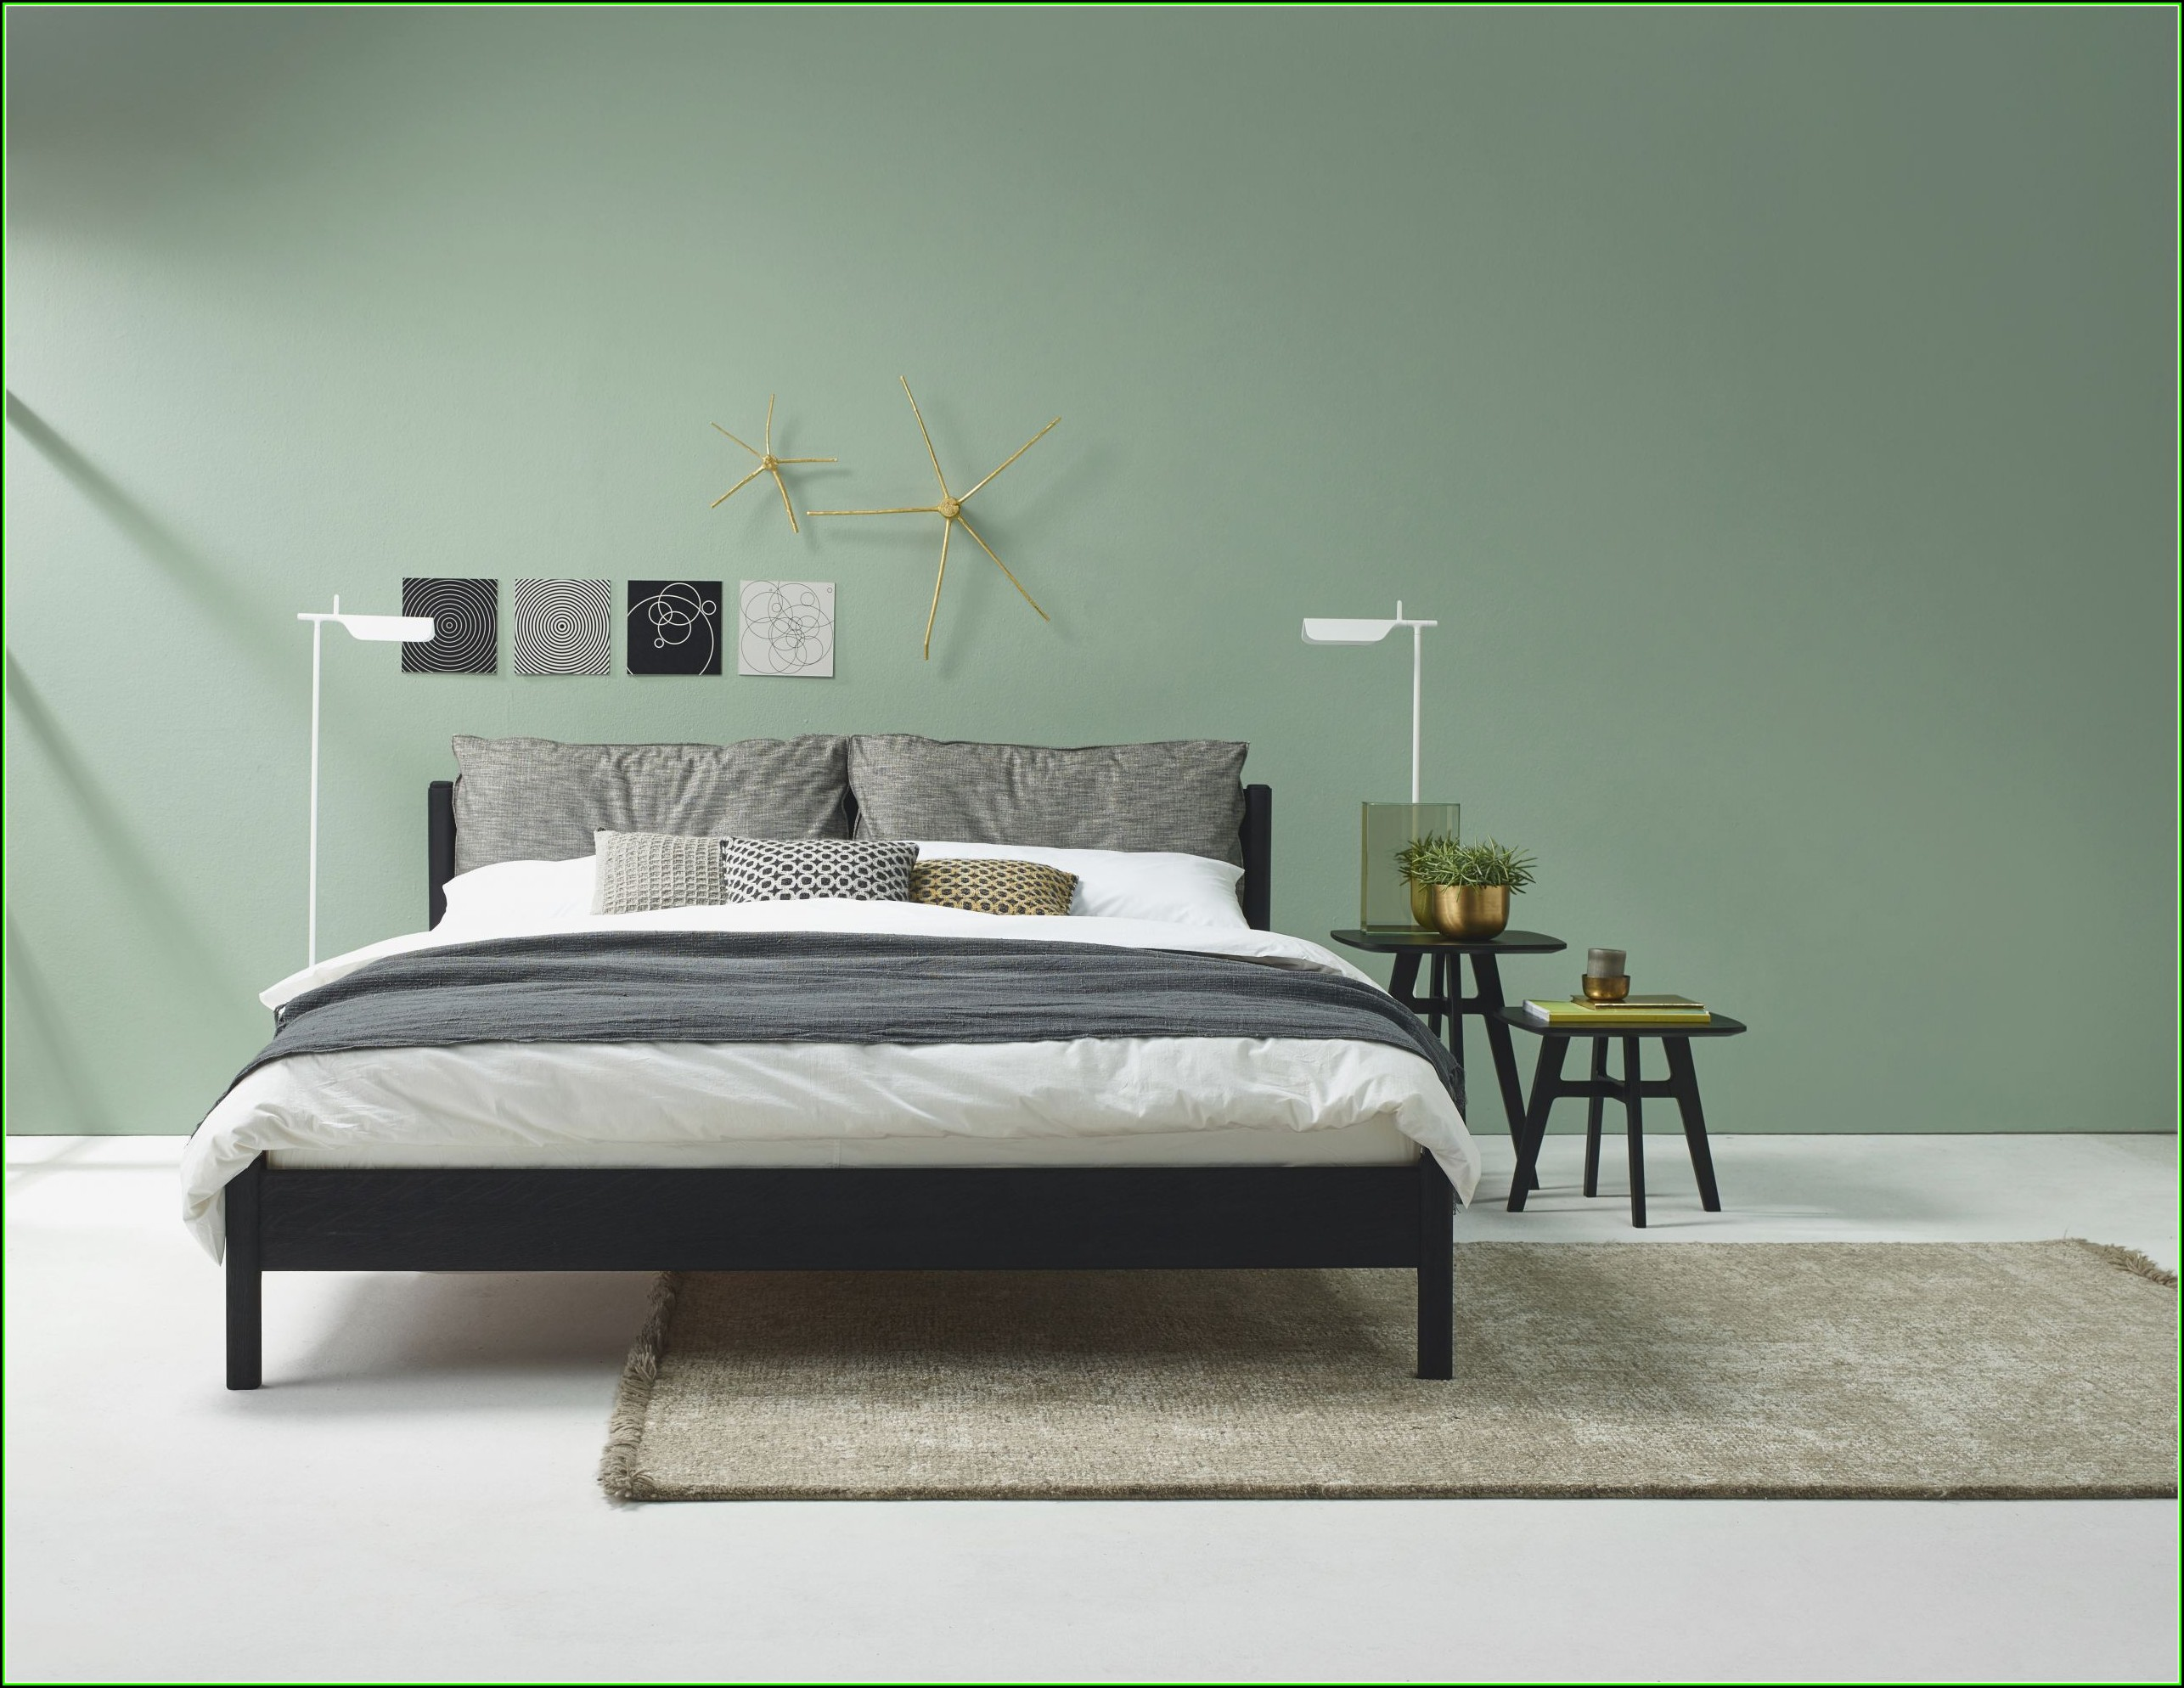 Schlafzimmer Ideen Grau Grün